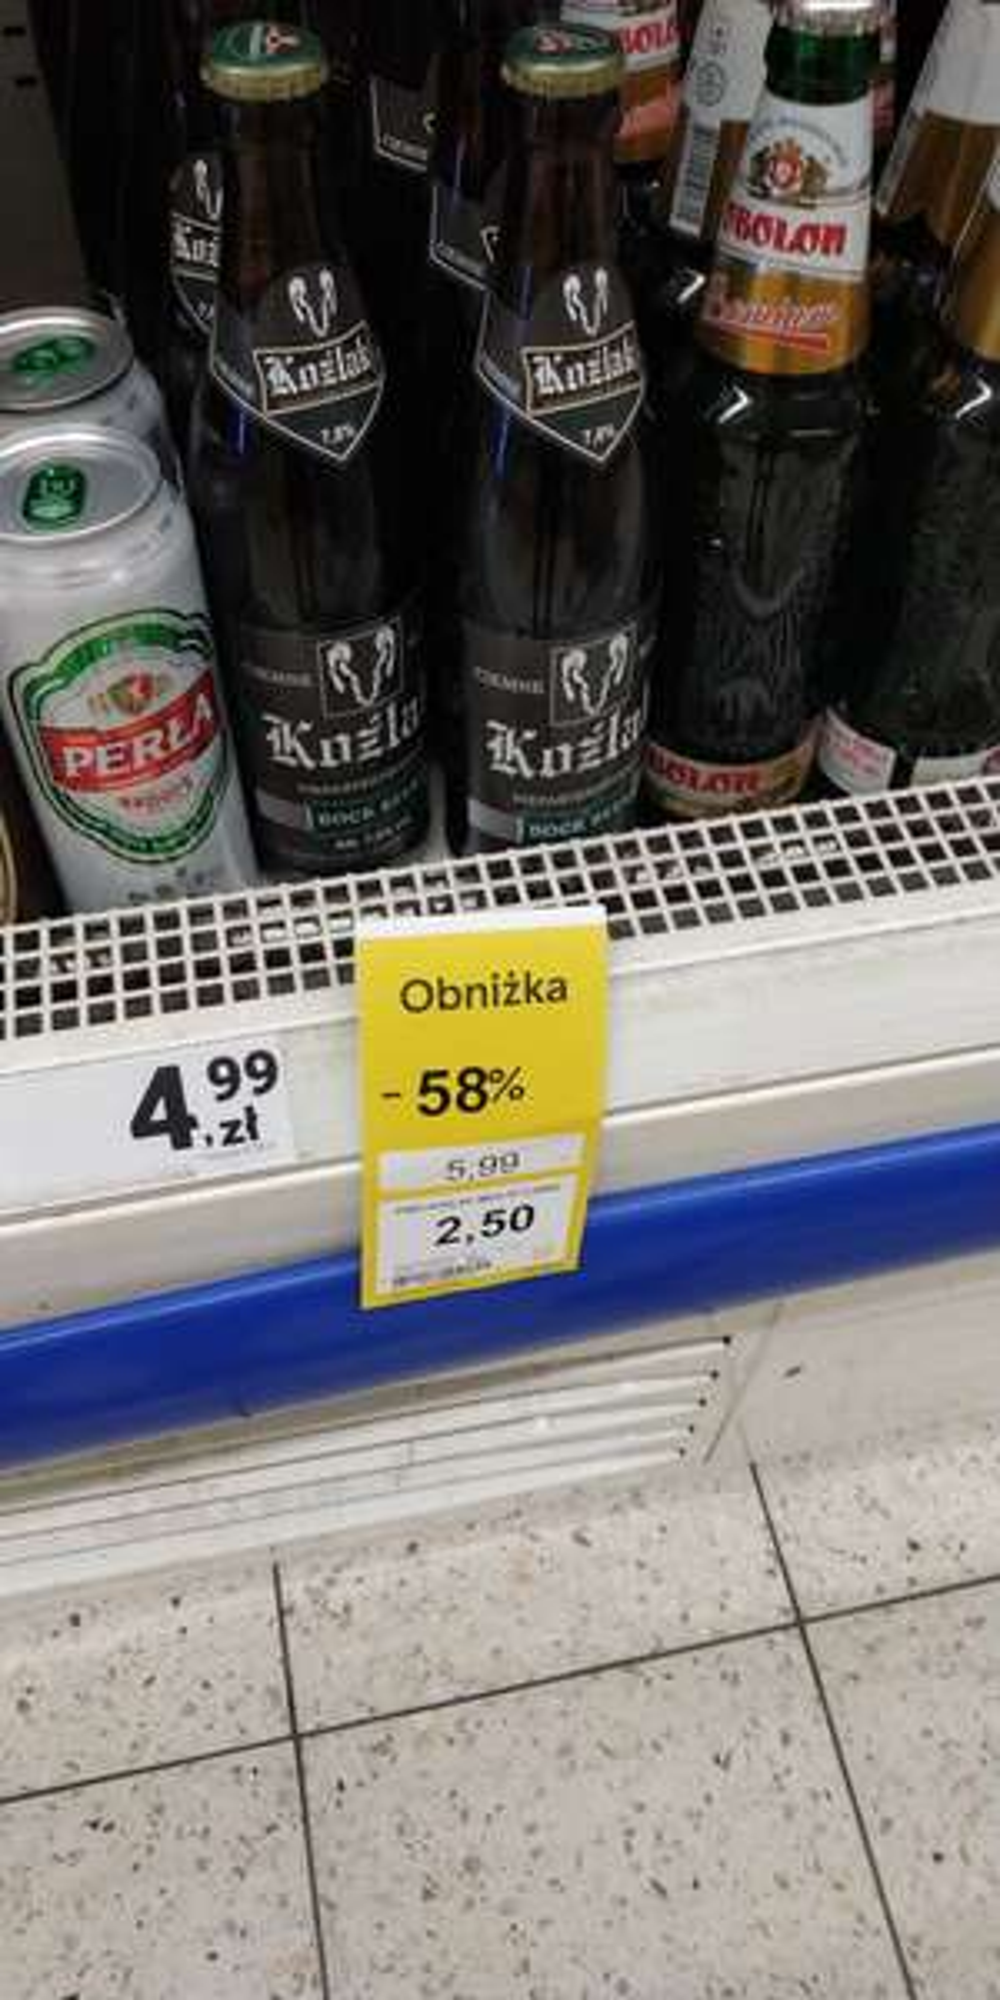 Piwo Koźlak Tesco (Leszno)